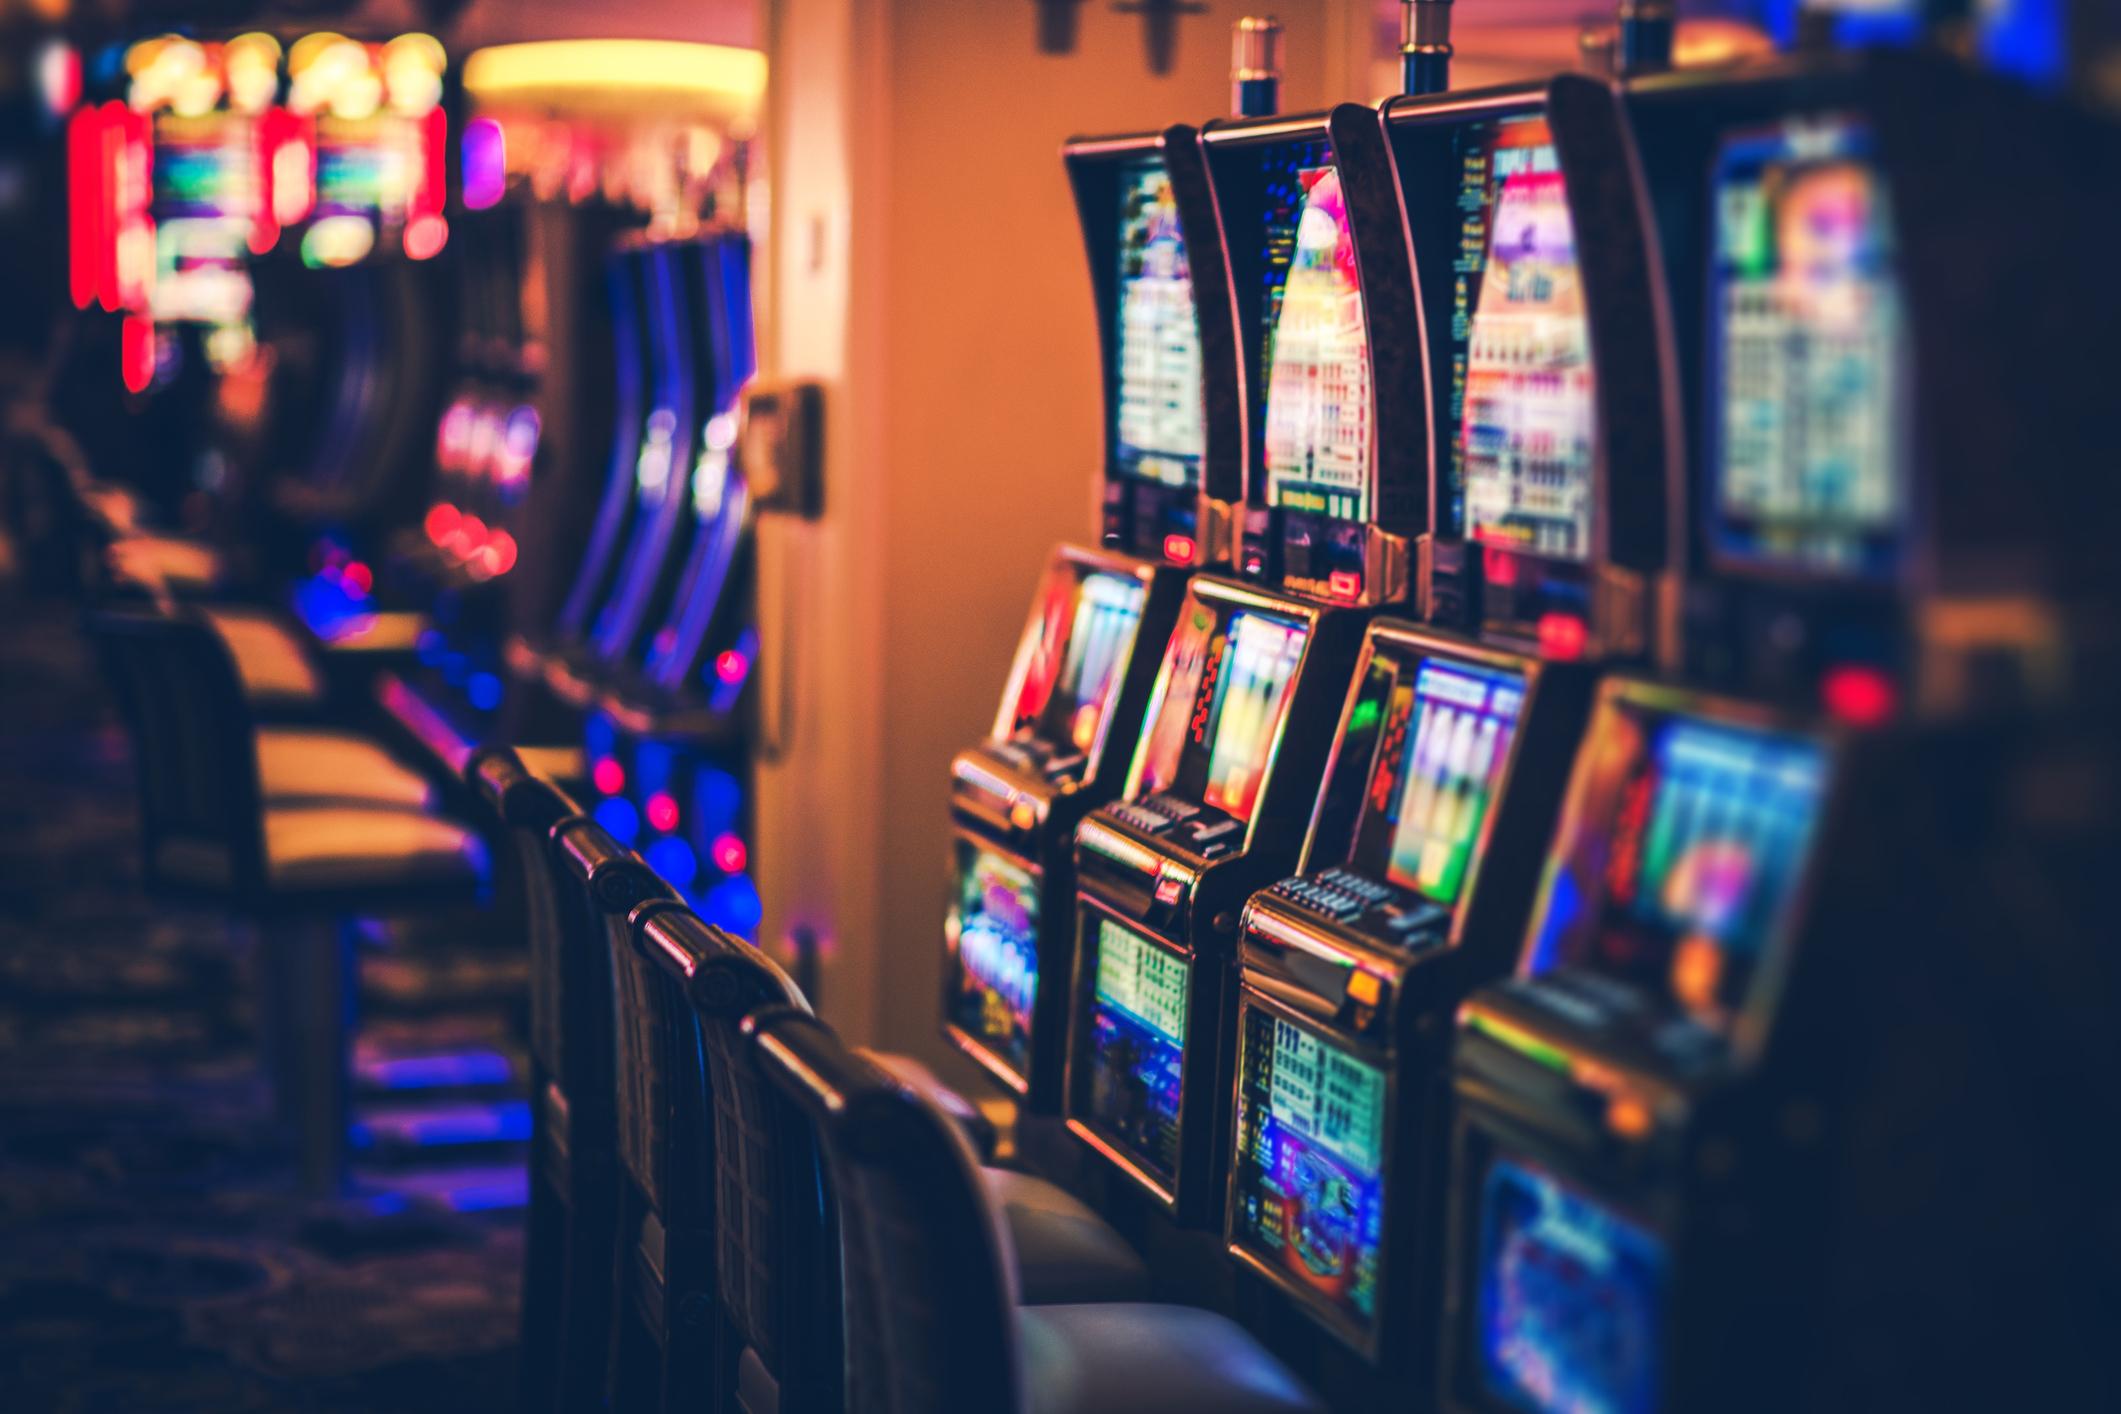 Rows of Casino Slot Machines Representing Gambling Addiction